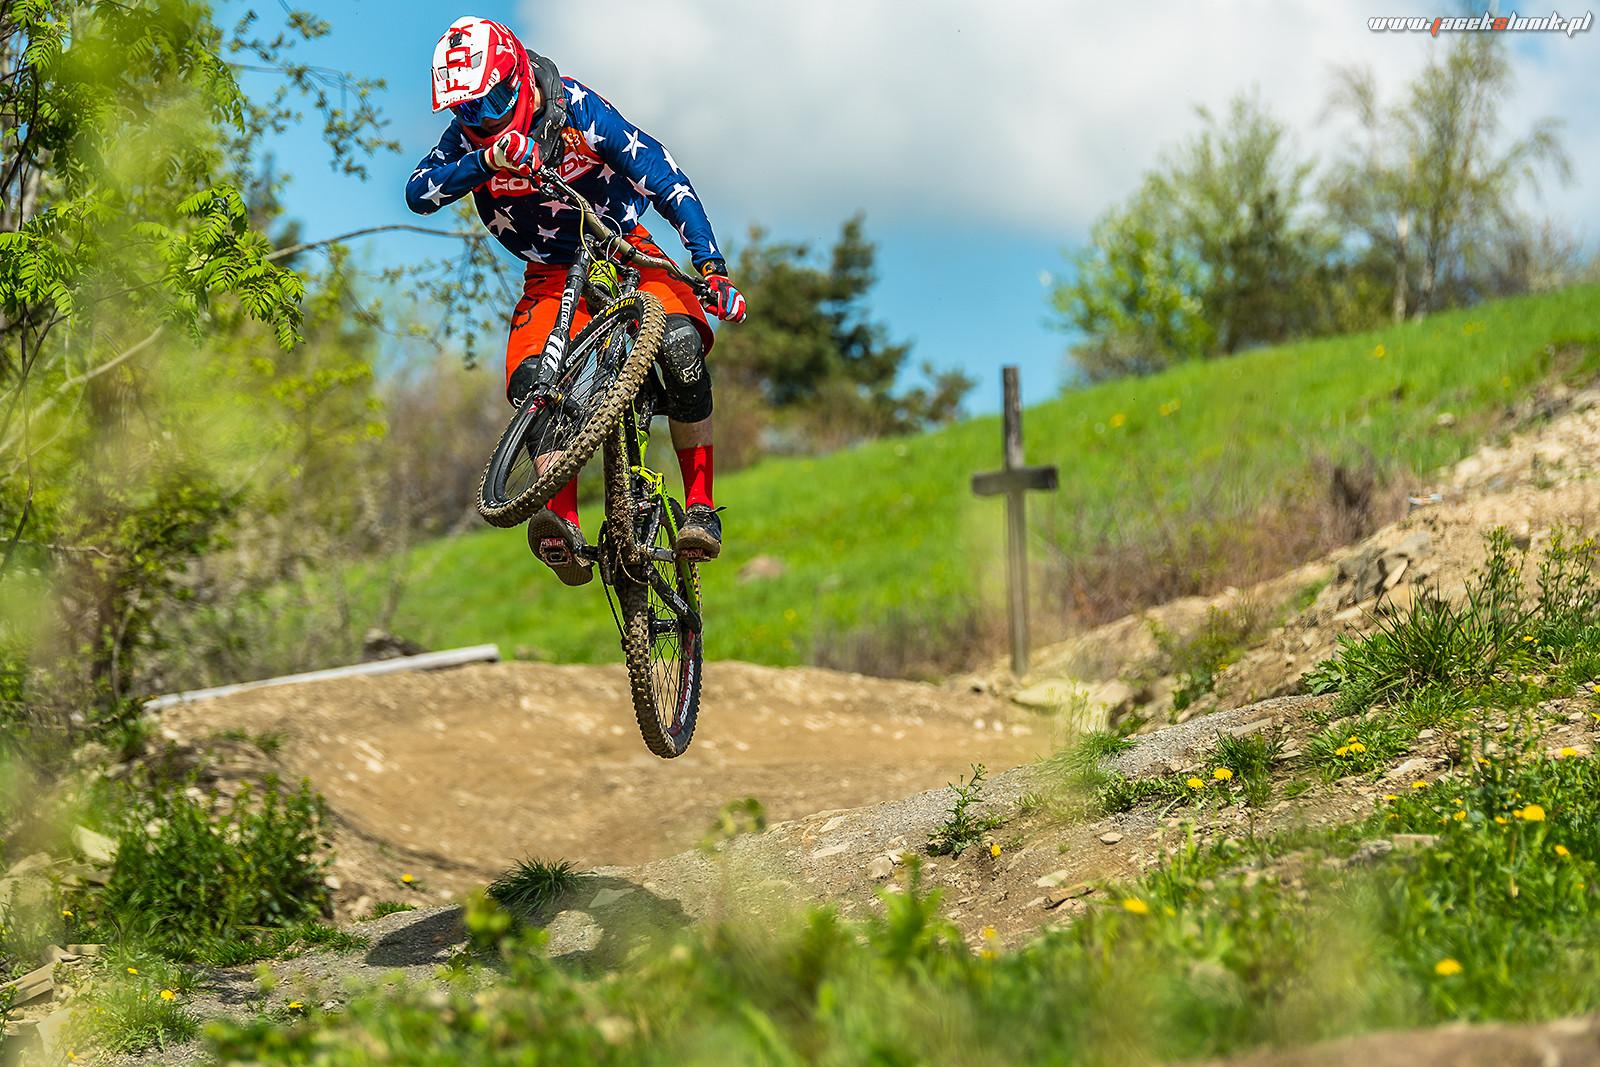 Hack to flat! - JacekSlonik - Mountain Biking Pictures - Vital MTB